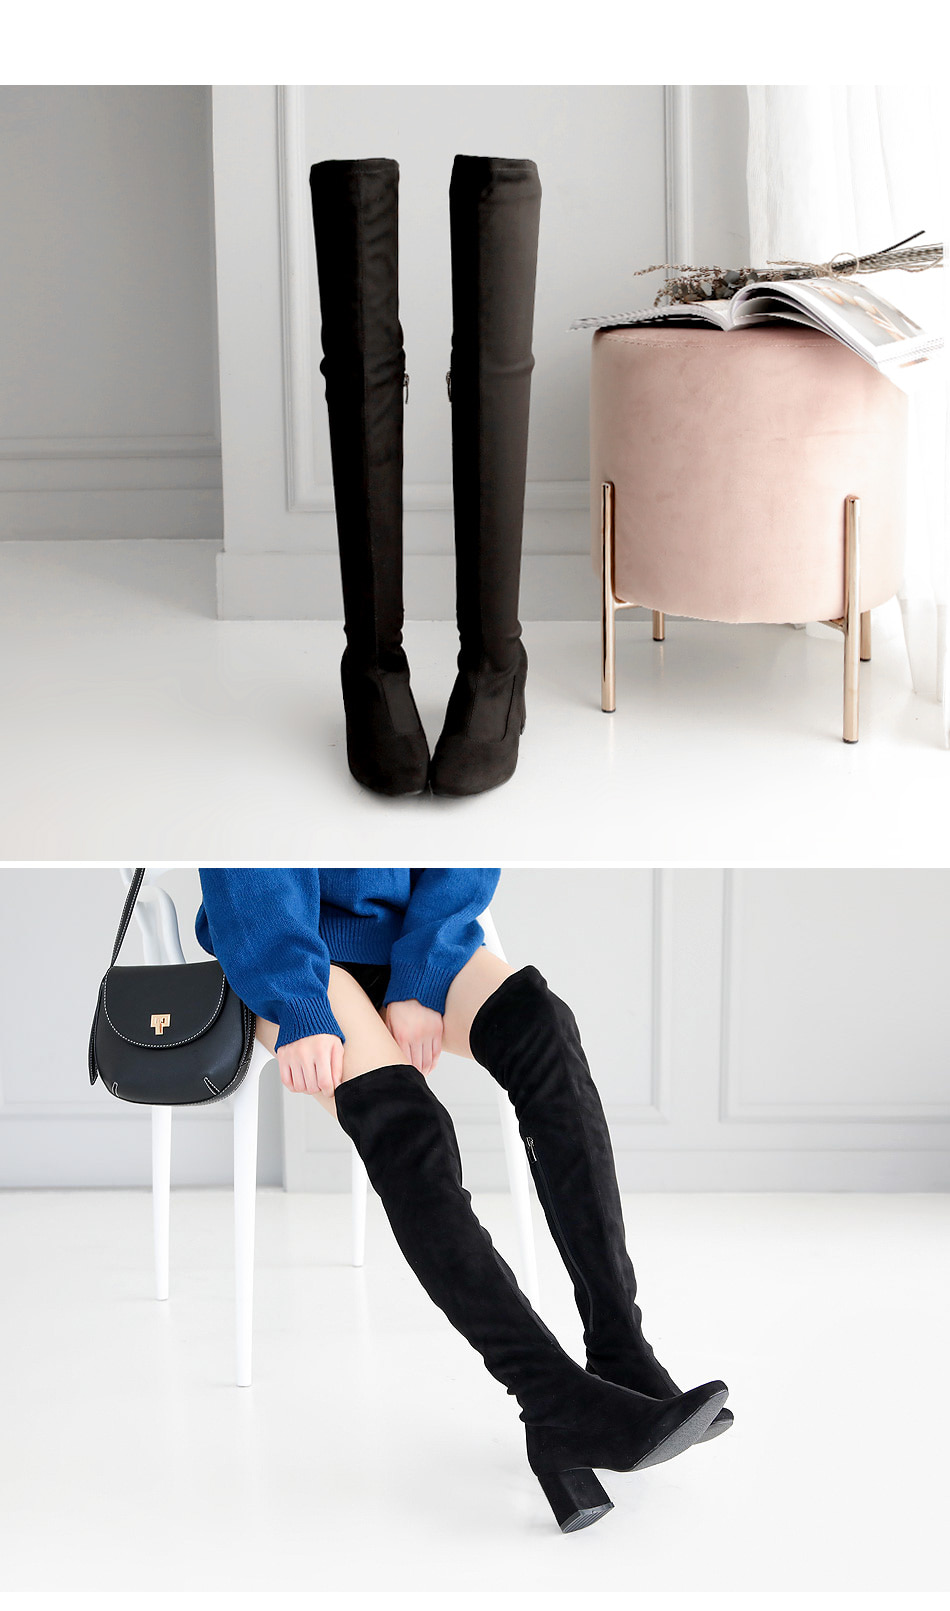 Groening Span Socks Long Boots 6.5cm